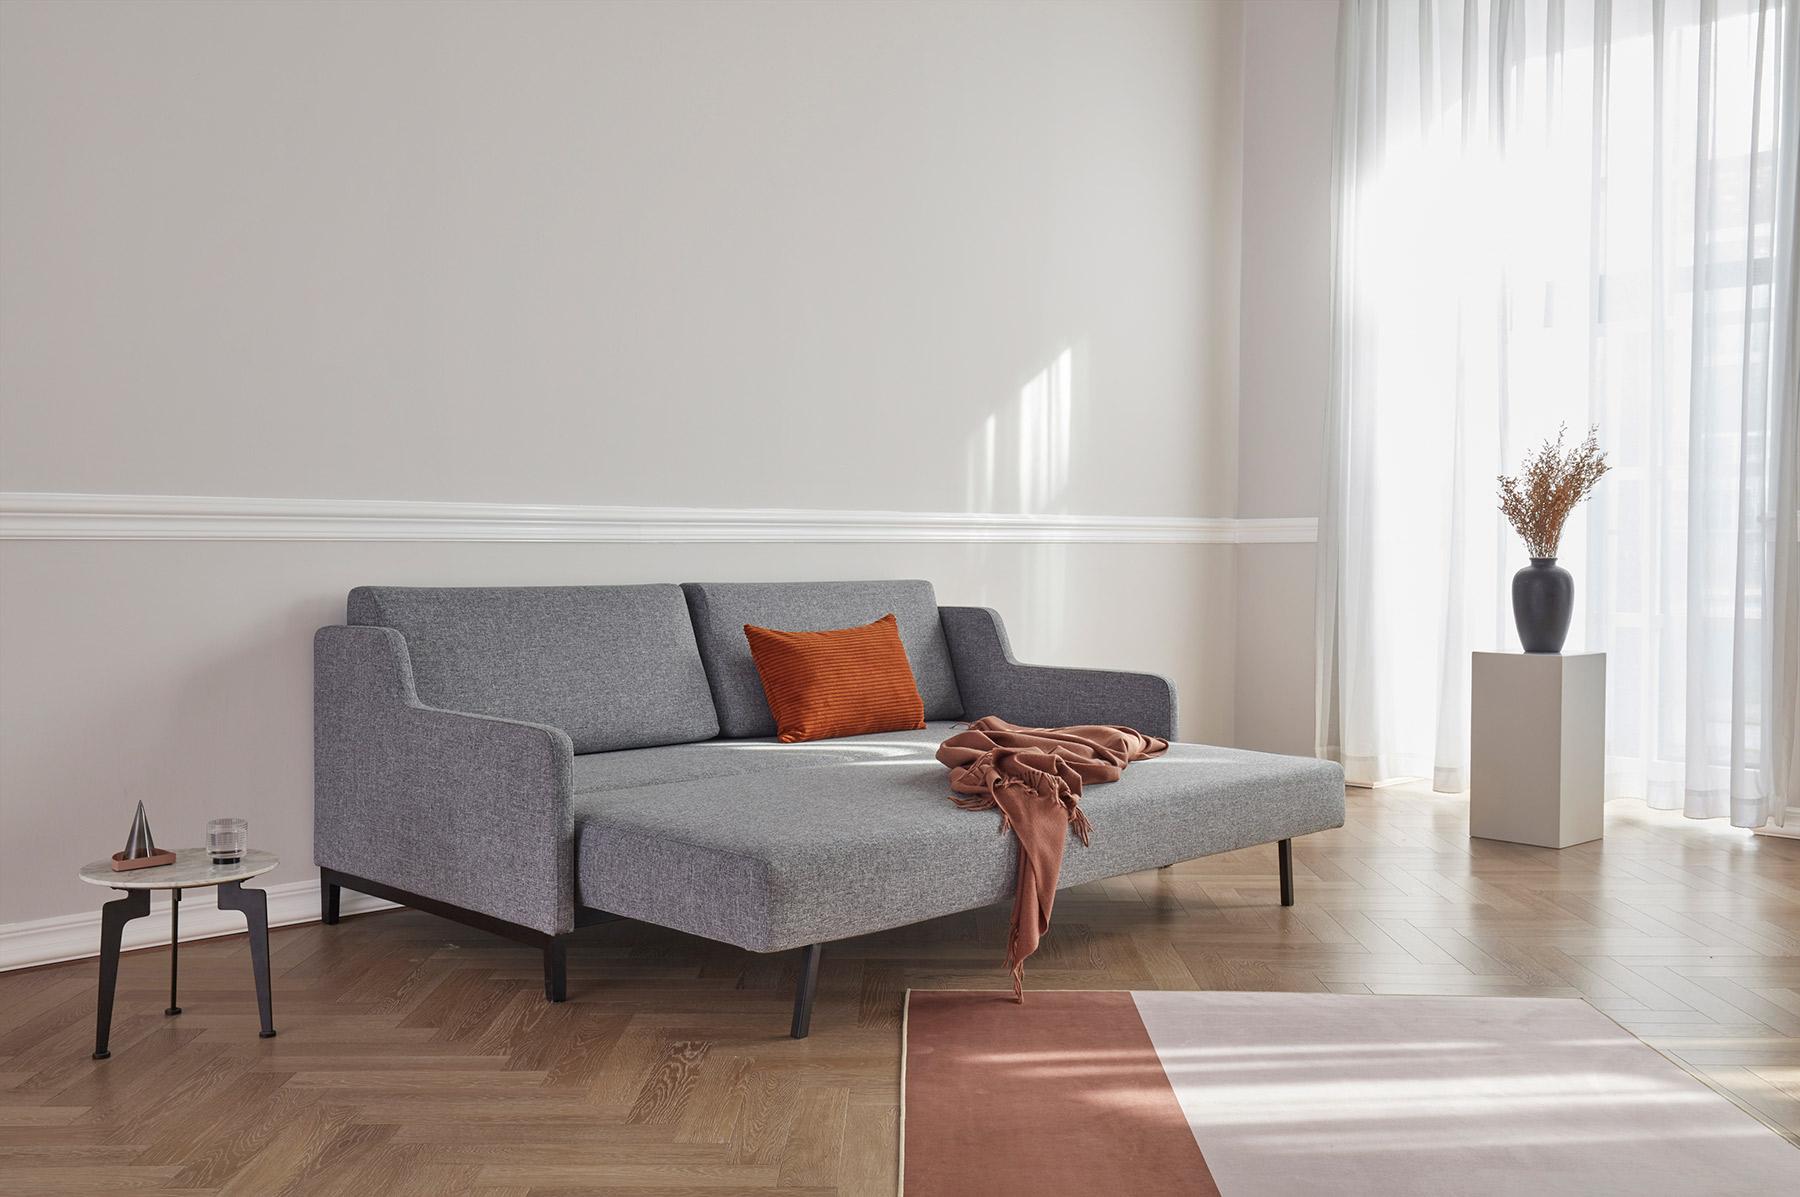 media/image/Hermod-Sofa-Bed-565-e1-web.jpg